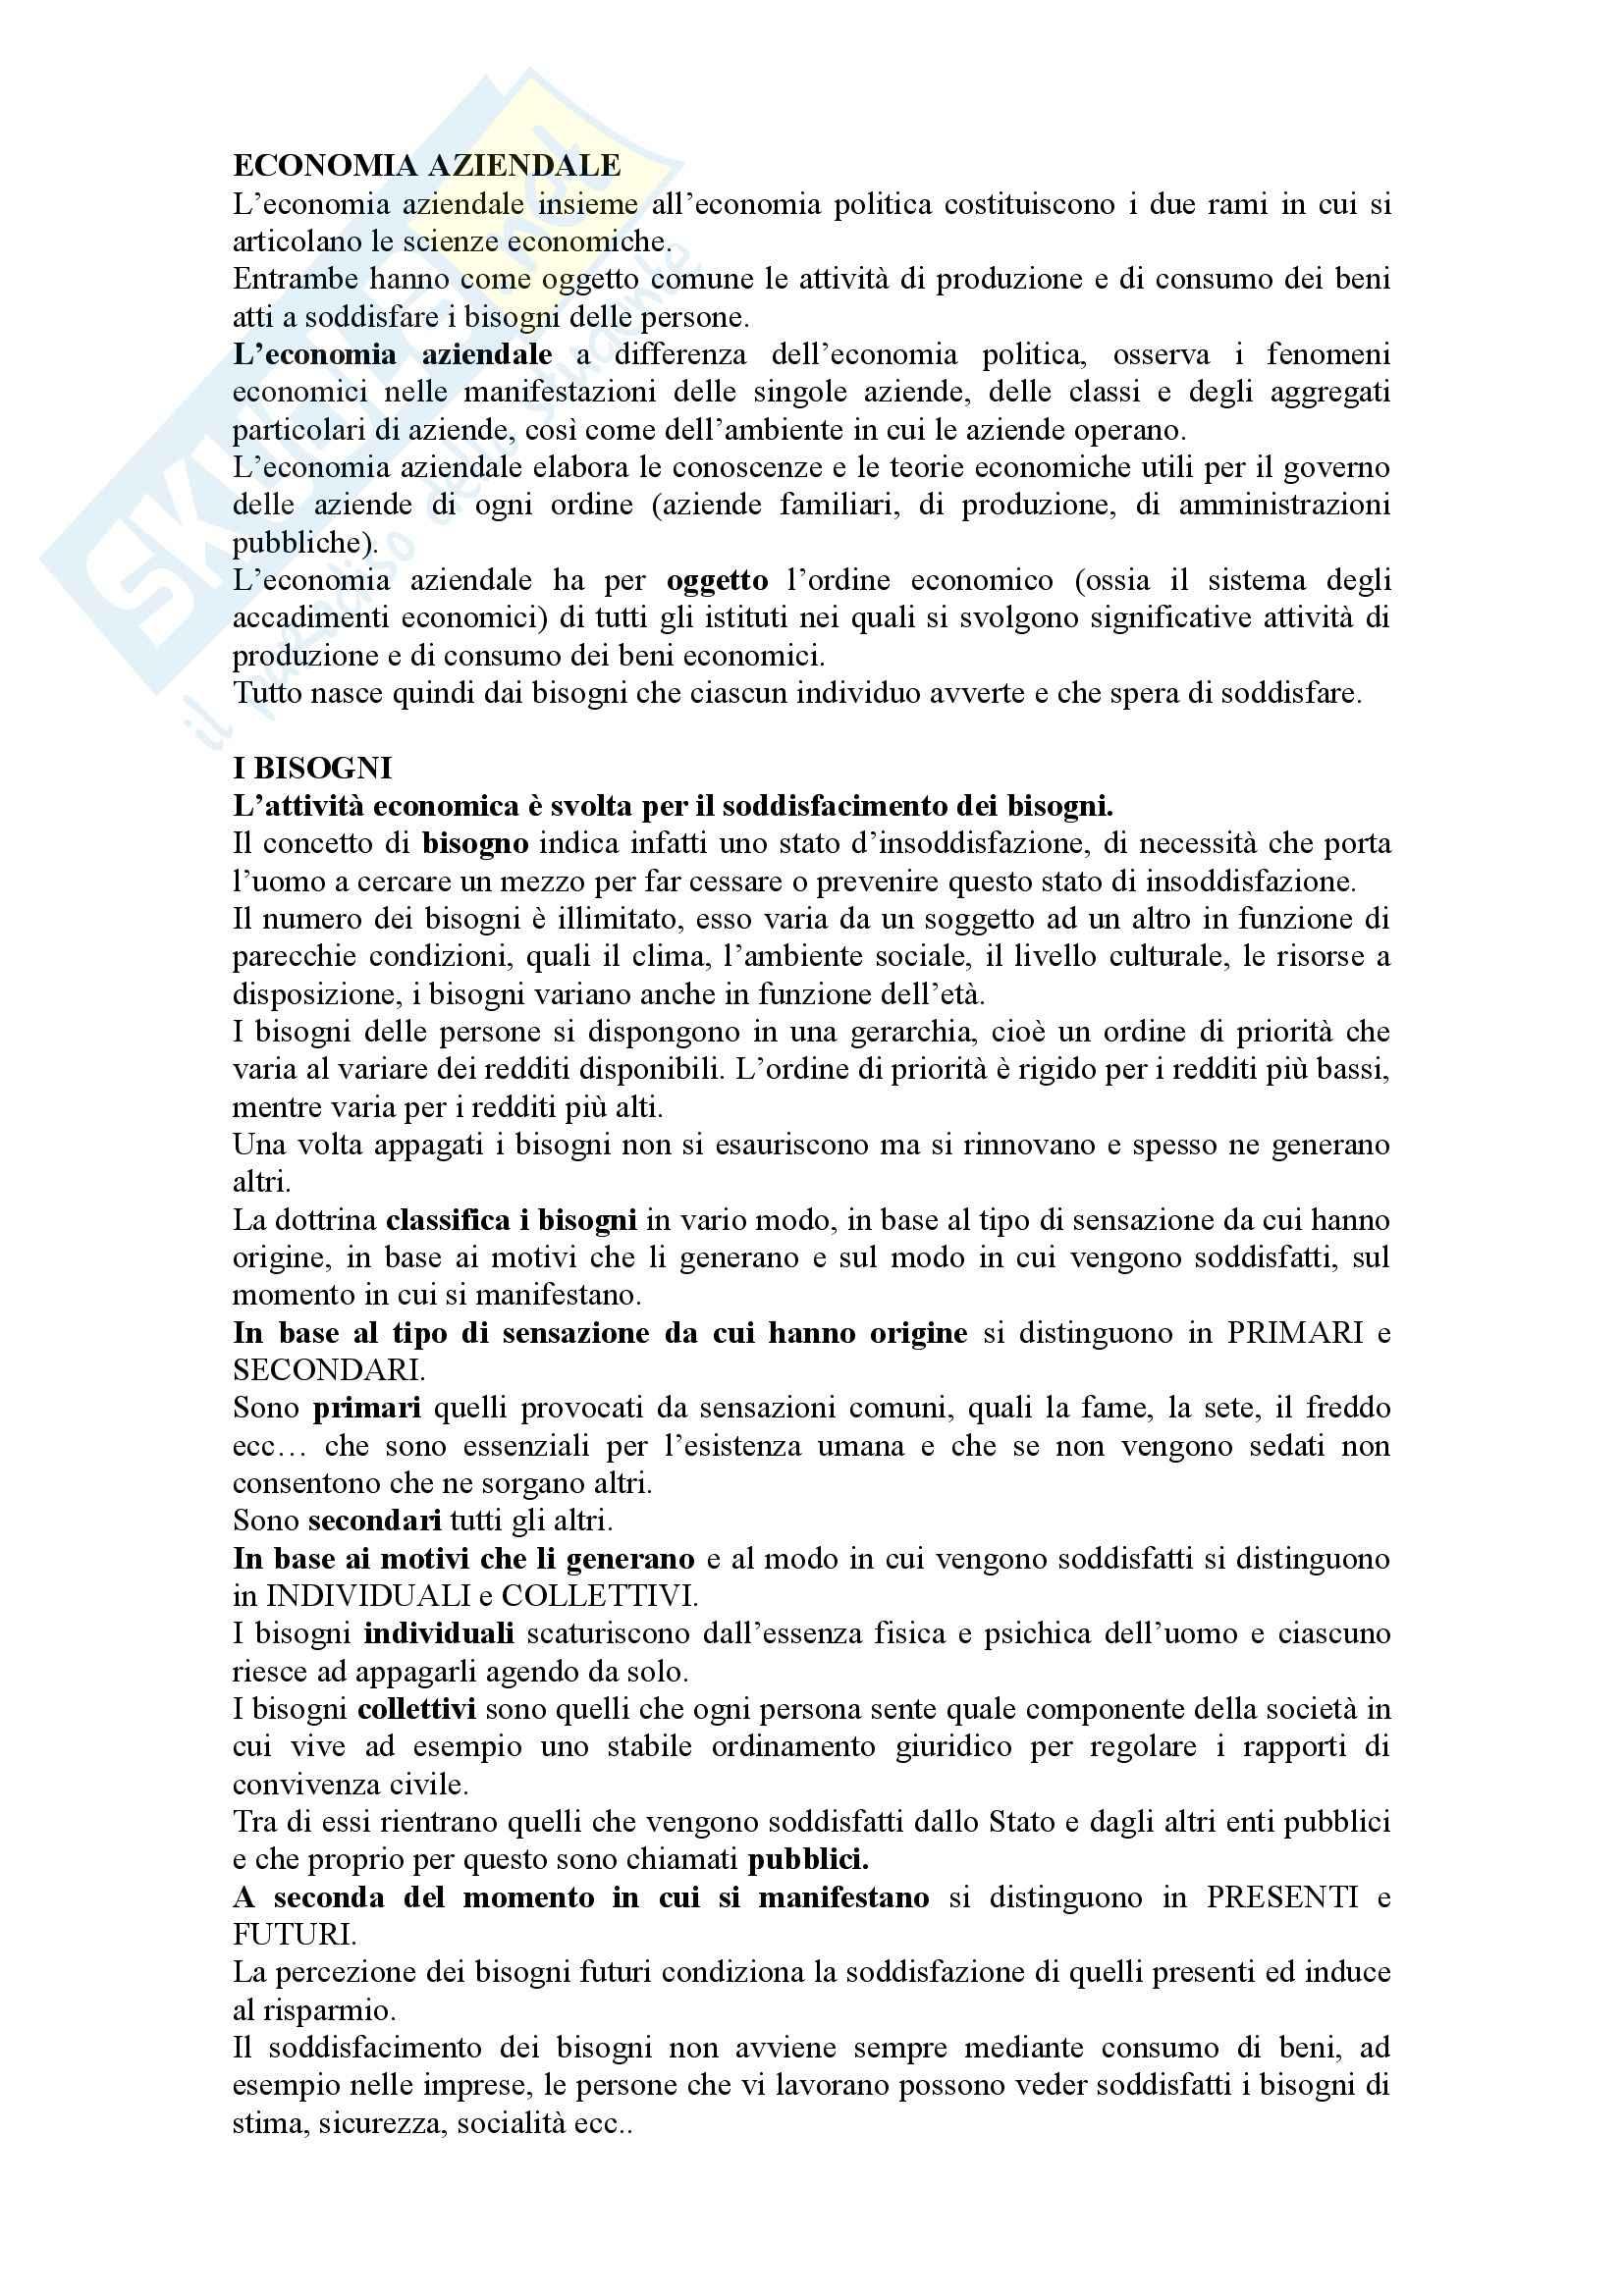 Economia aziendale, Airoldi,  Brunetti - Sintesi